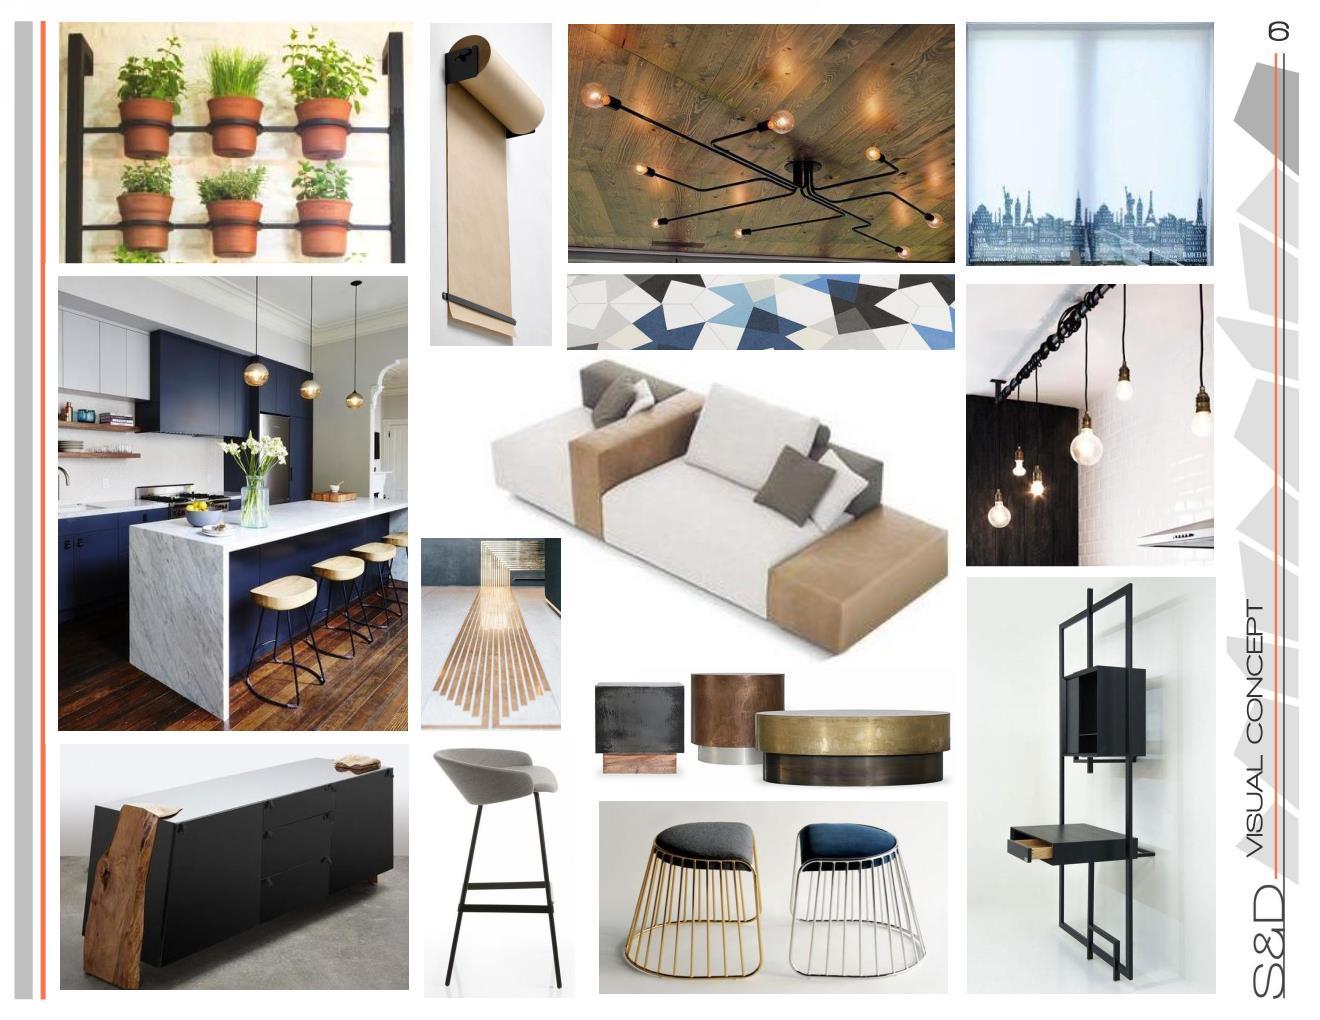 09-15-16 Ren Stapleton_Club Lounge Layout Options Page 007.jpg